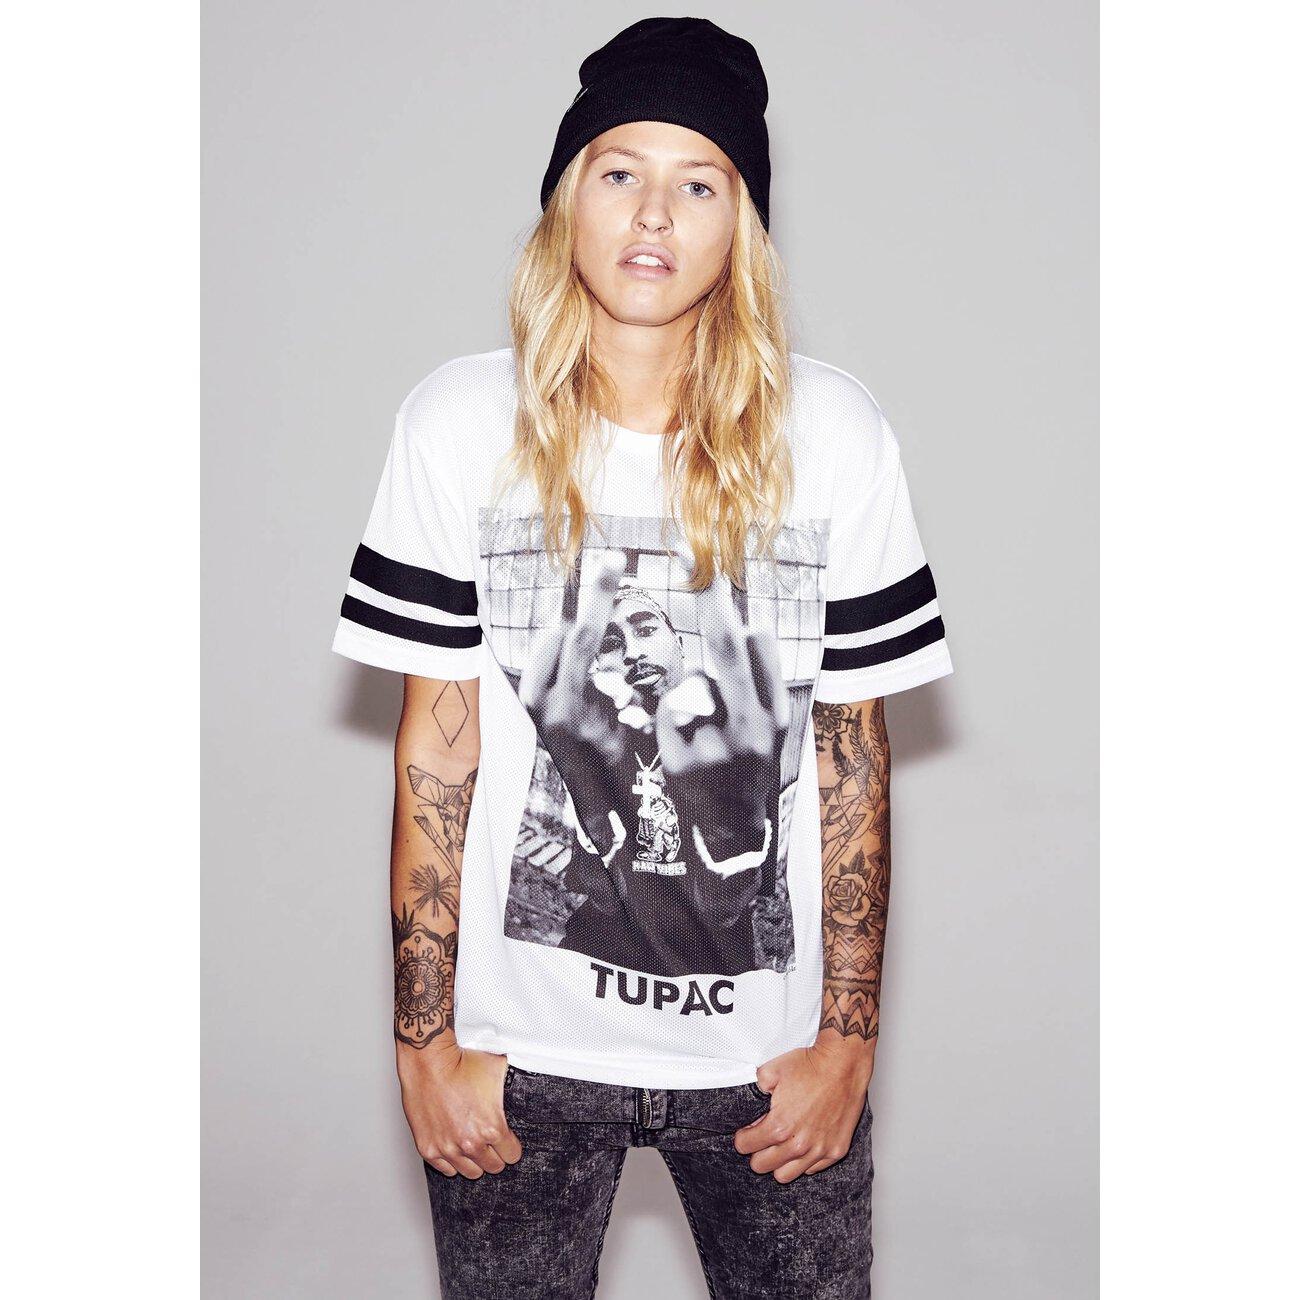 cf26ba087c689f mister-tee-t-shirt-damen-2pac-stripes-print-kurzarm-shirt-mt-363-schwarz.jpg